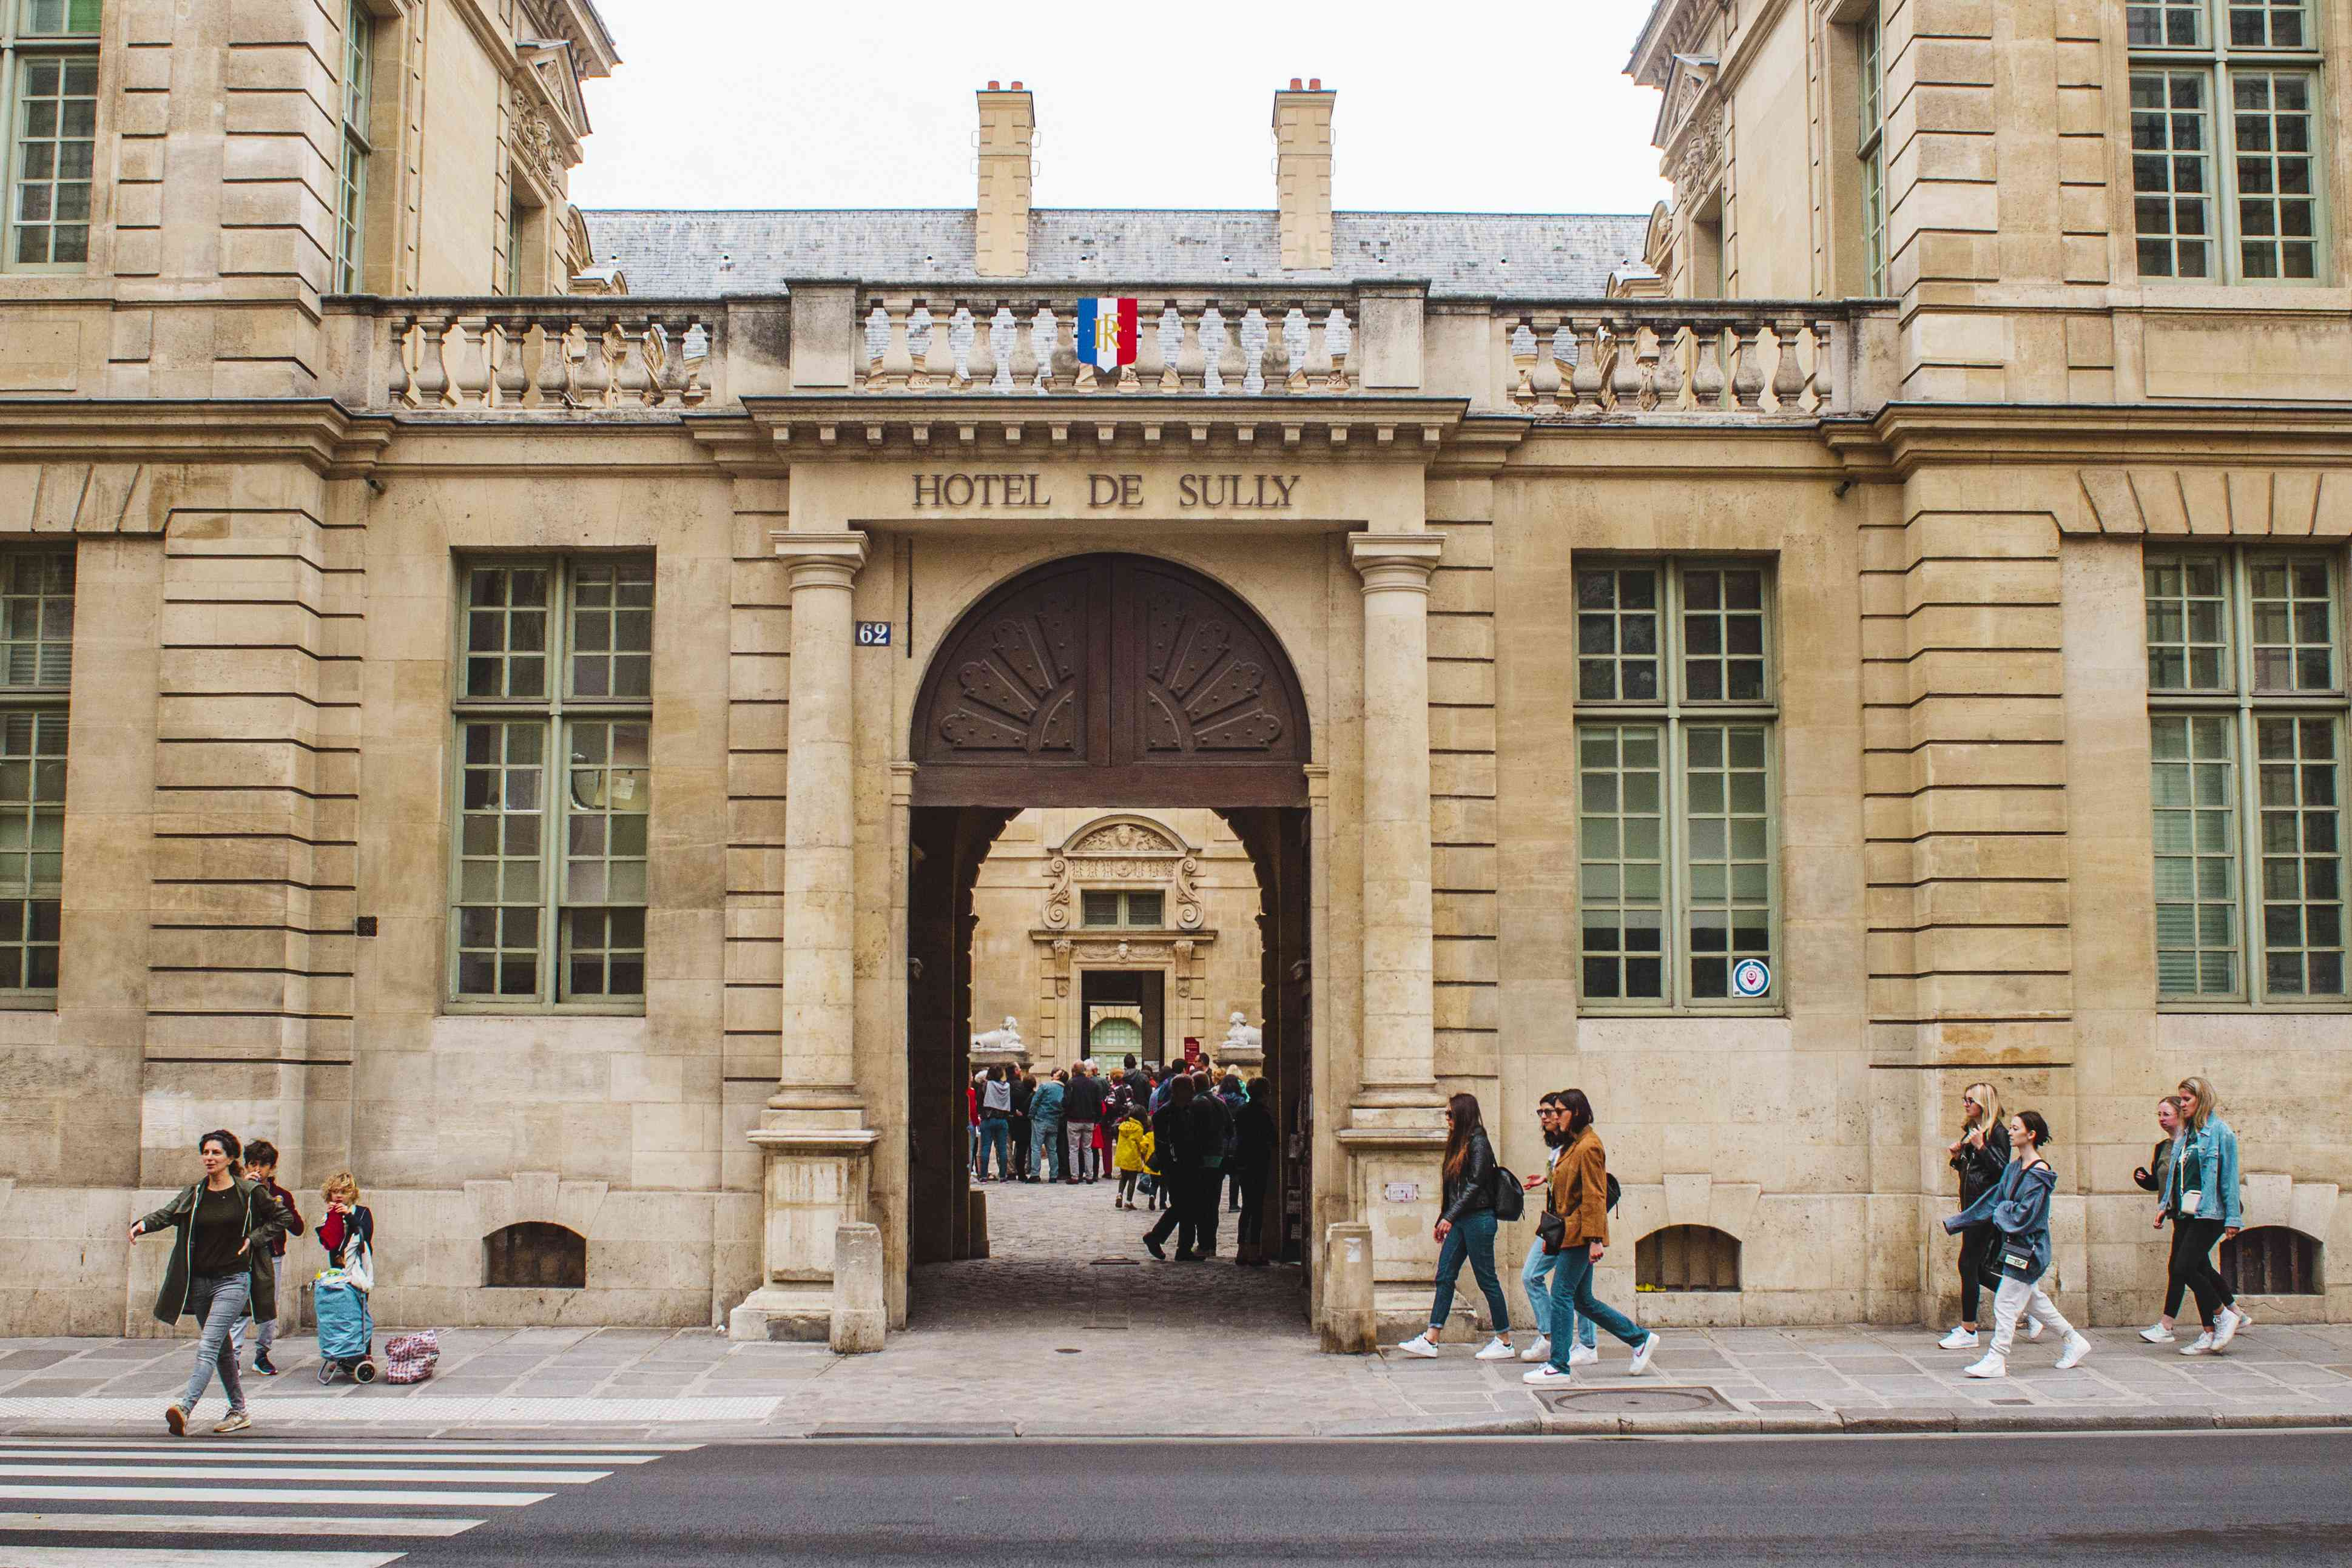 Exterior of Hotel De Sully